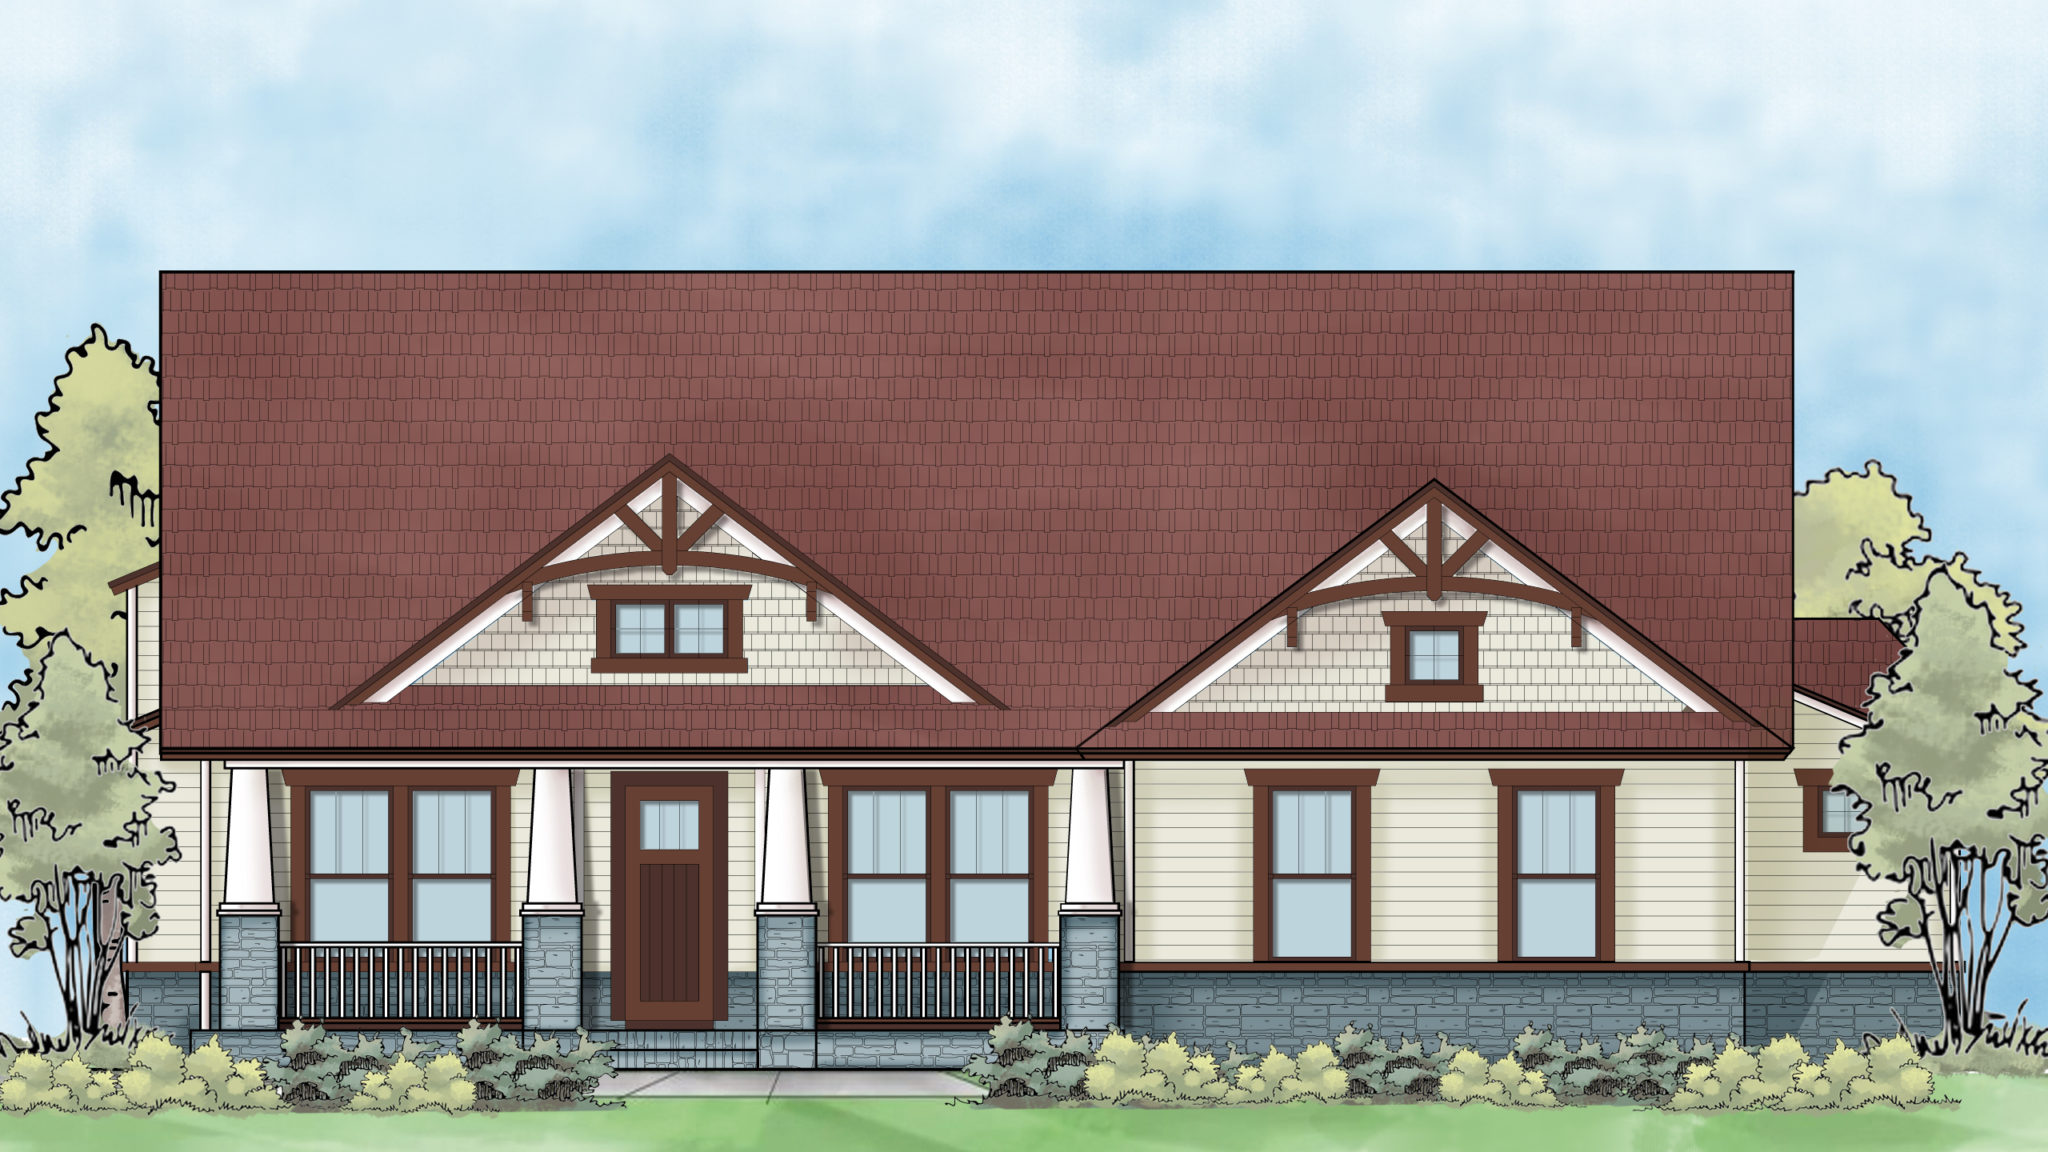 residential home color rendering design